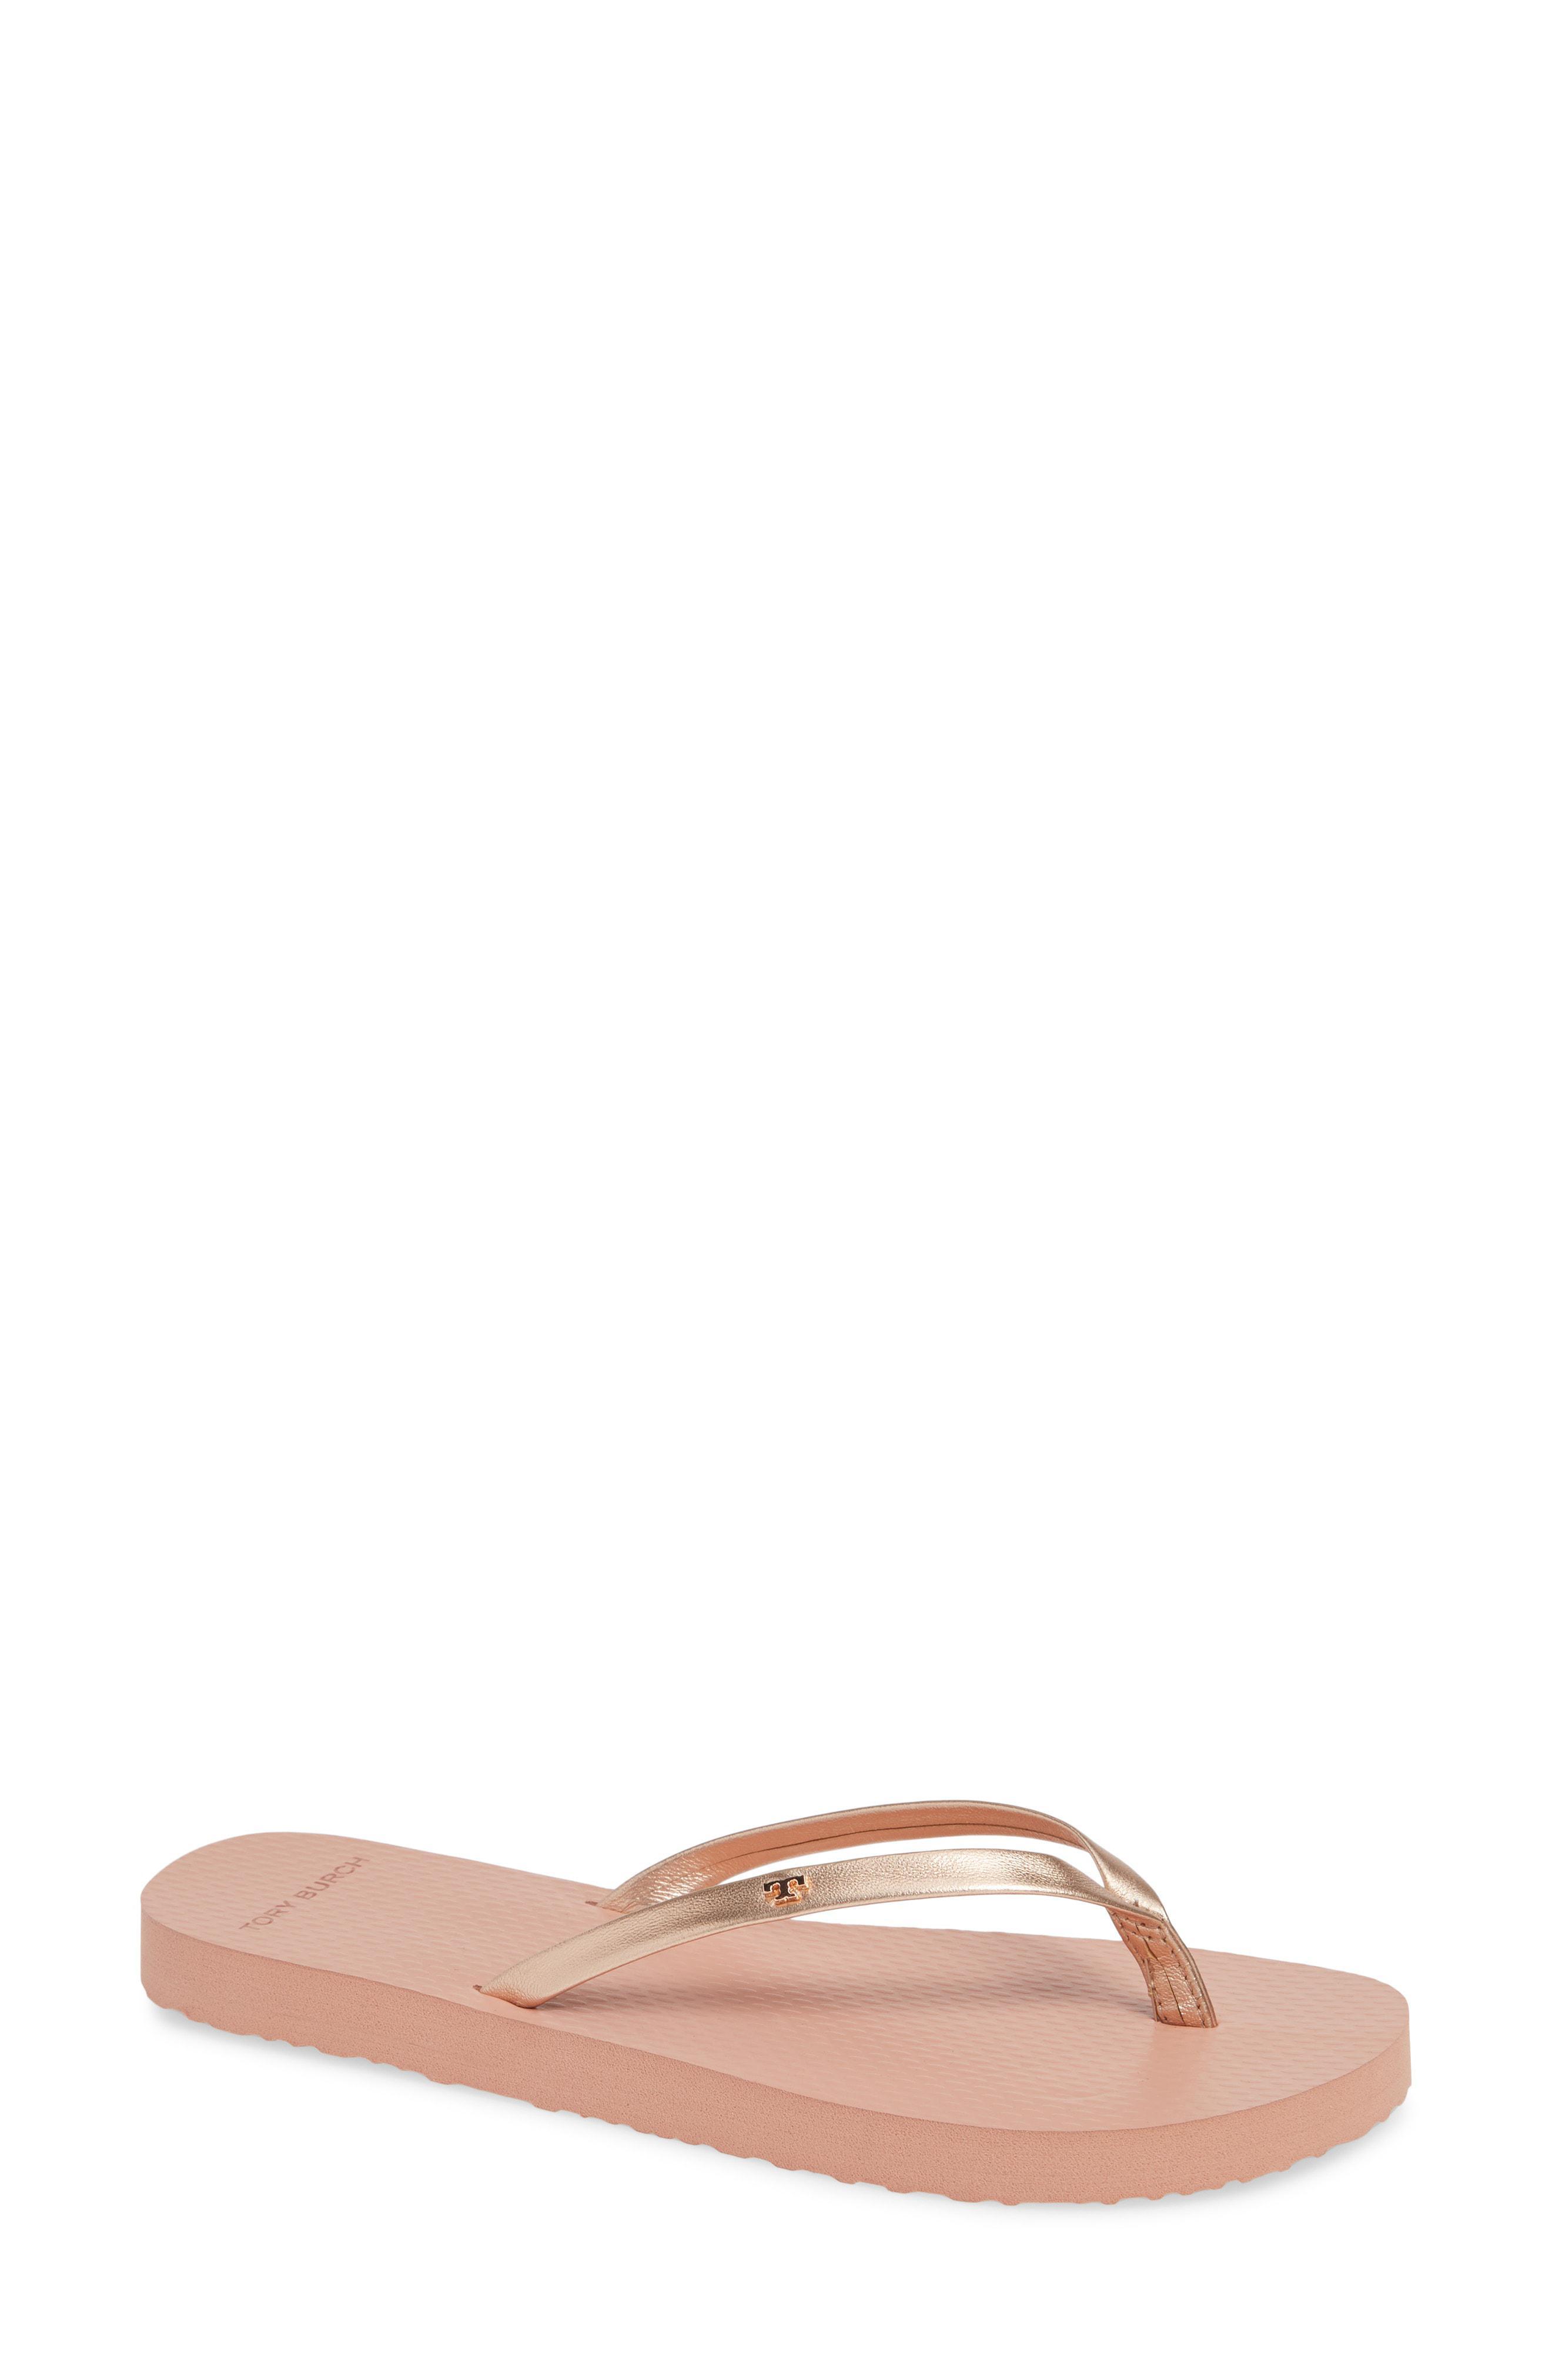 8d28f33bd6b Lyst - Tory Burch Logo Metallic Flip Flop in Pink